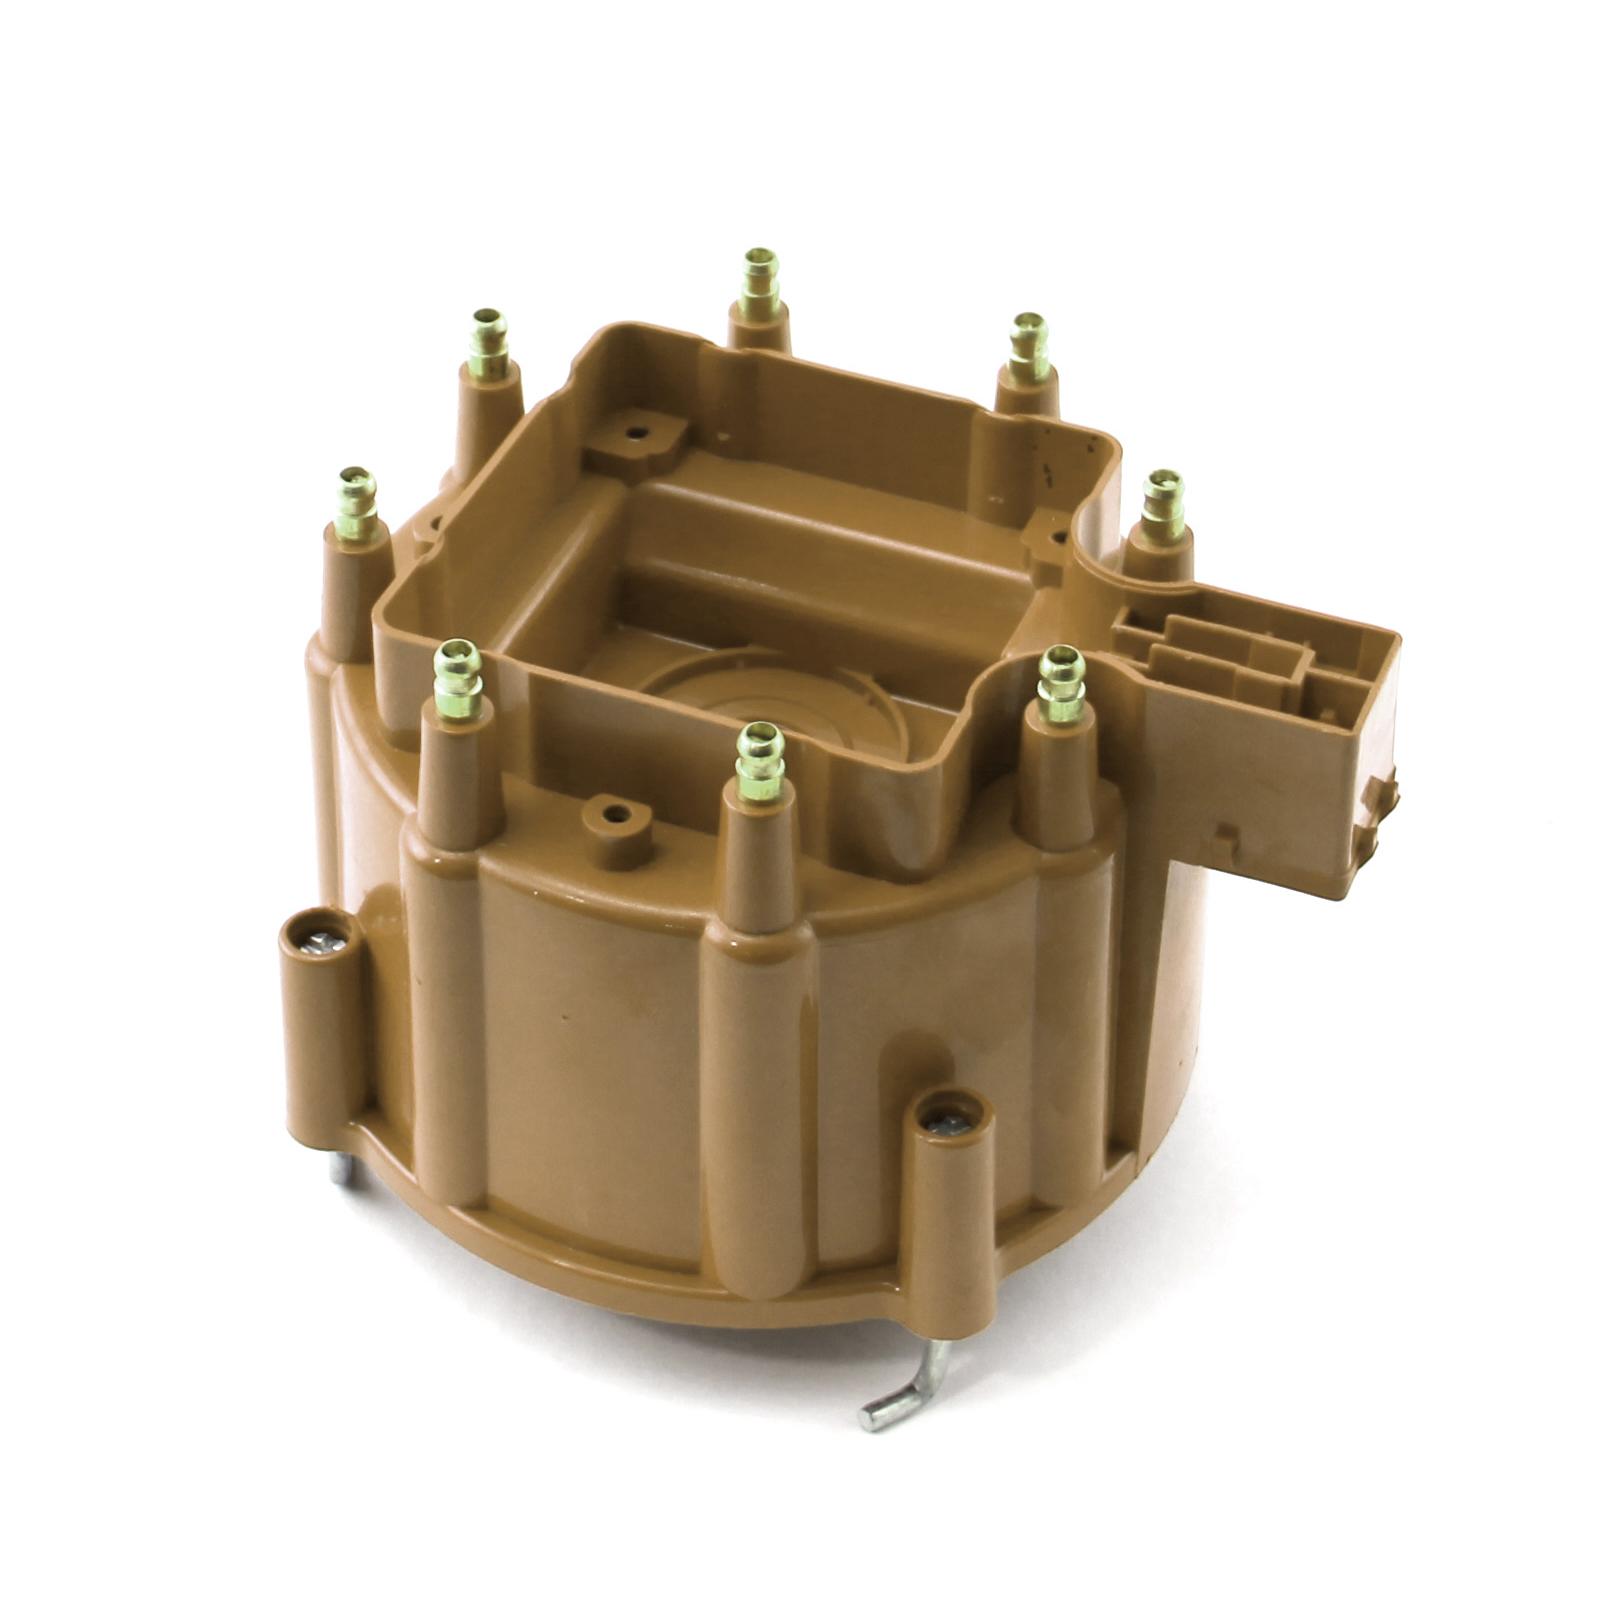 HEI Replacement Distributor Cap Brass Terminals - Brown